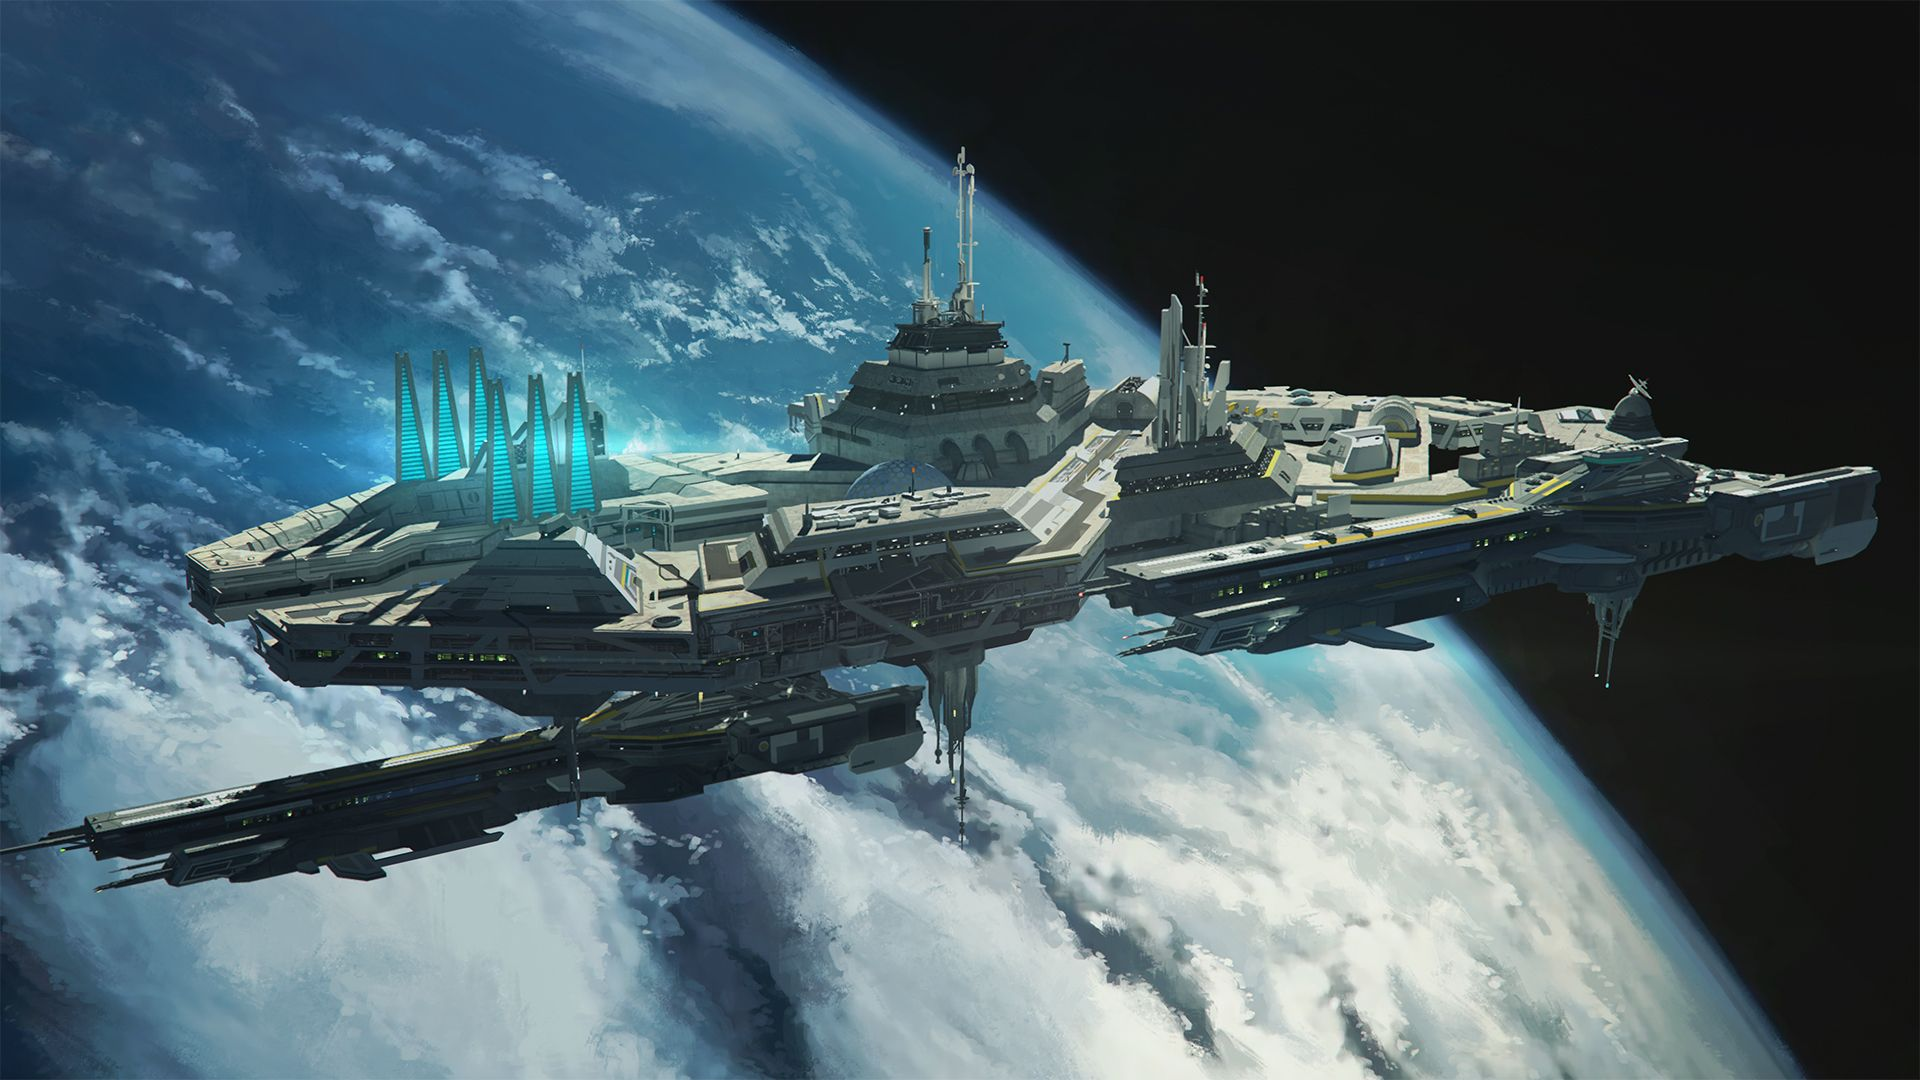 space station by franklinchandeviantartcom on